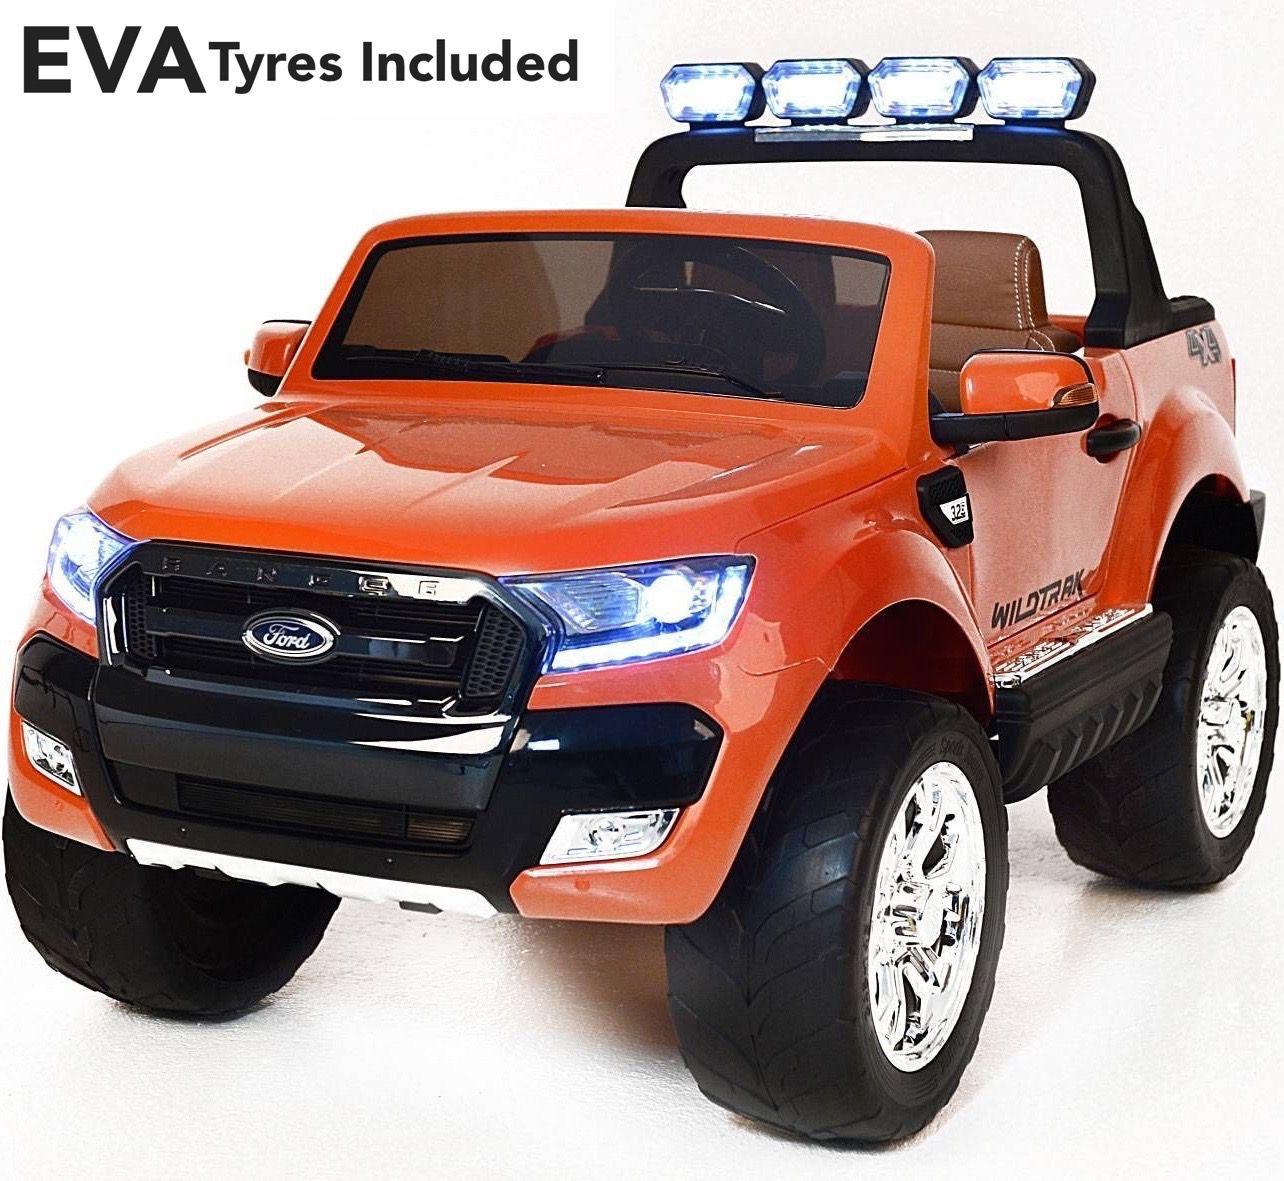 Ford ranger wildtrak licensed 4wd 24v battery ride on jeep orange eva